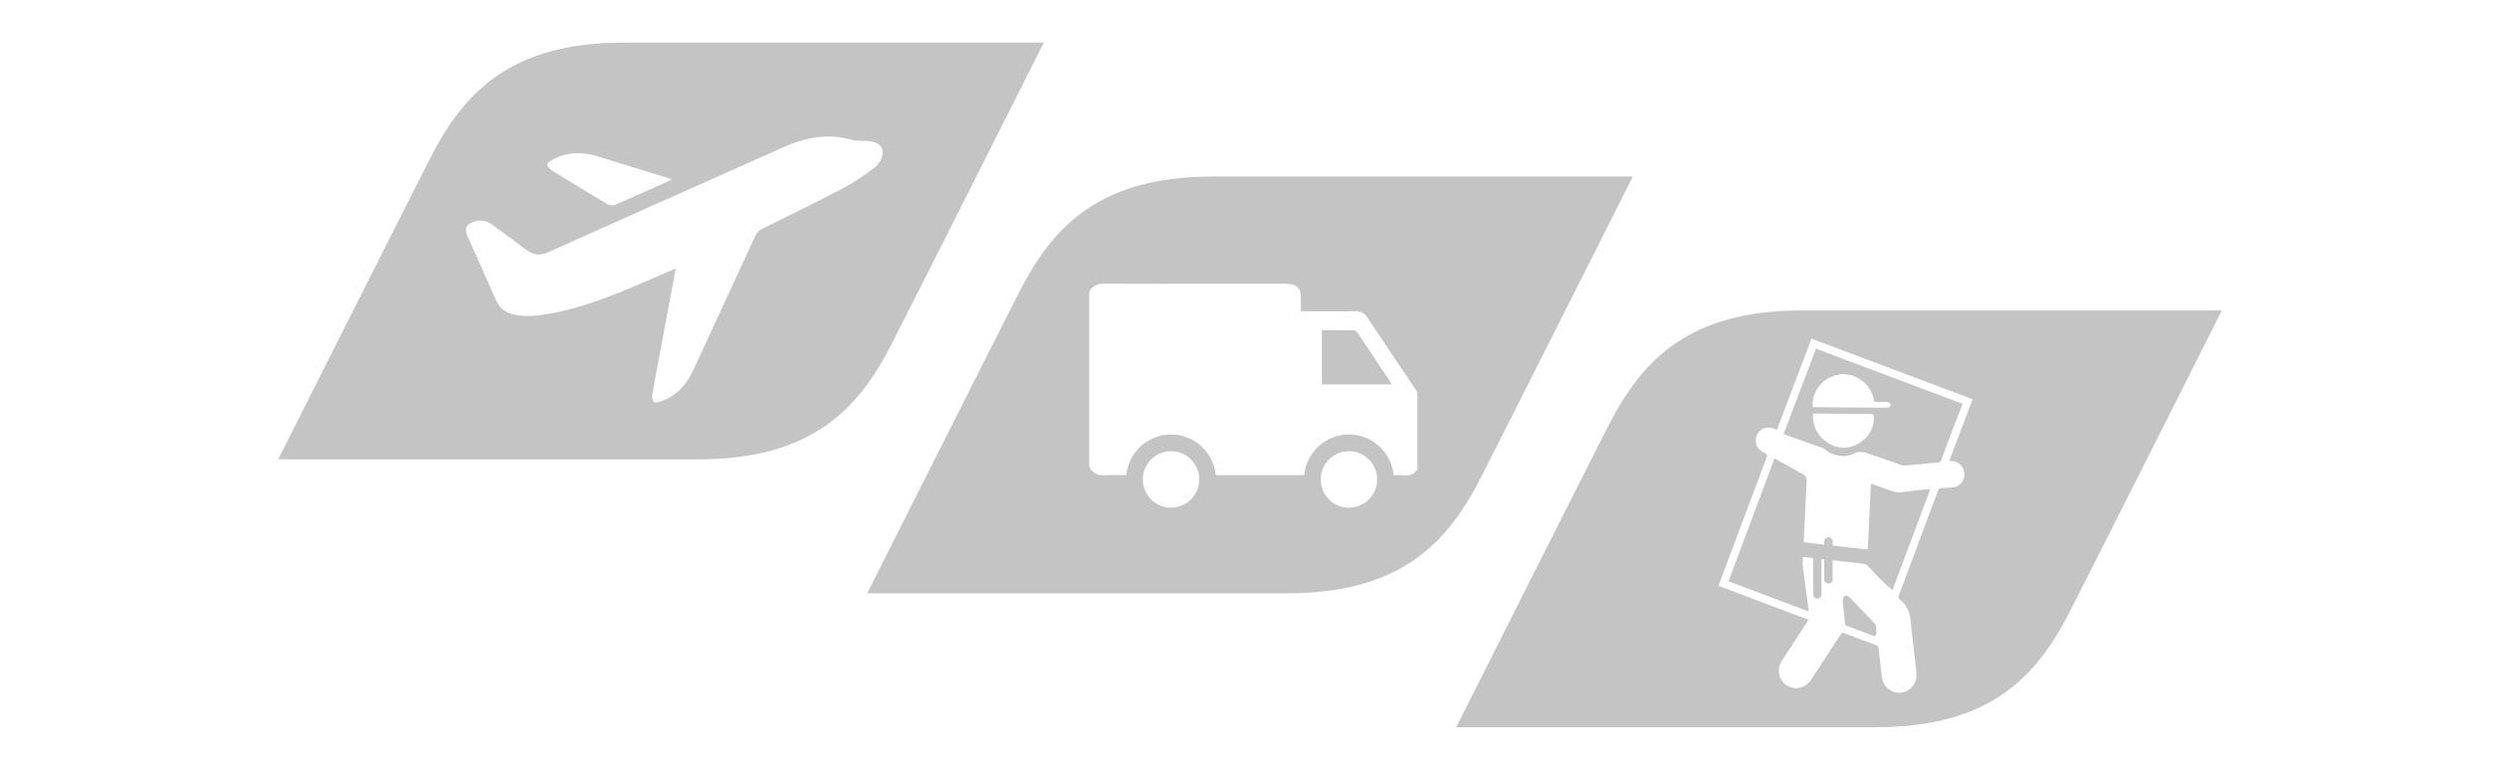 Freight_Installer Combo_ Logo_RGB Grey1.jpg